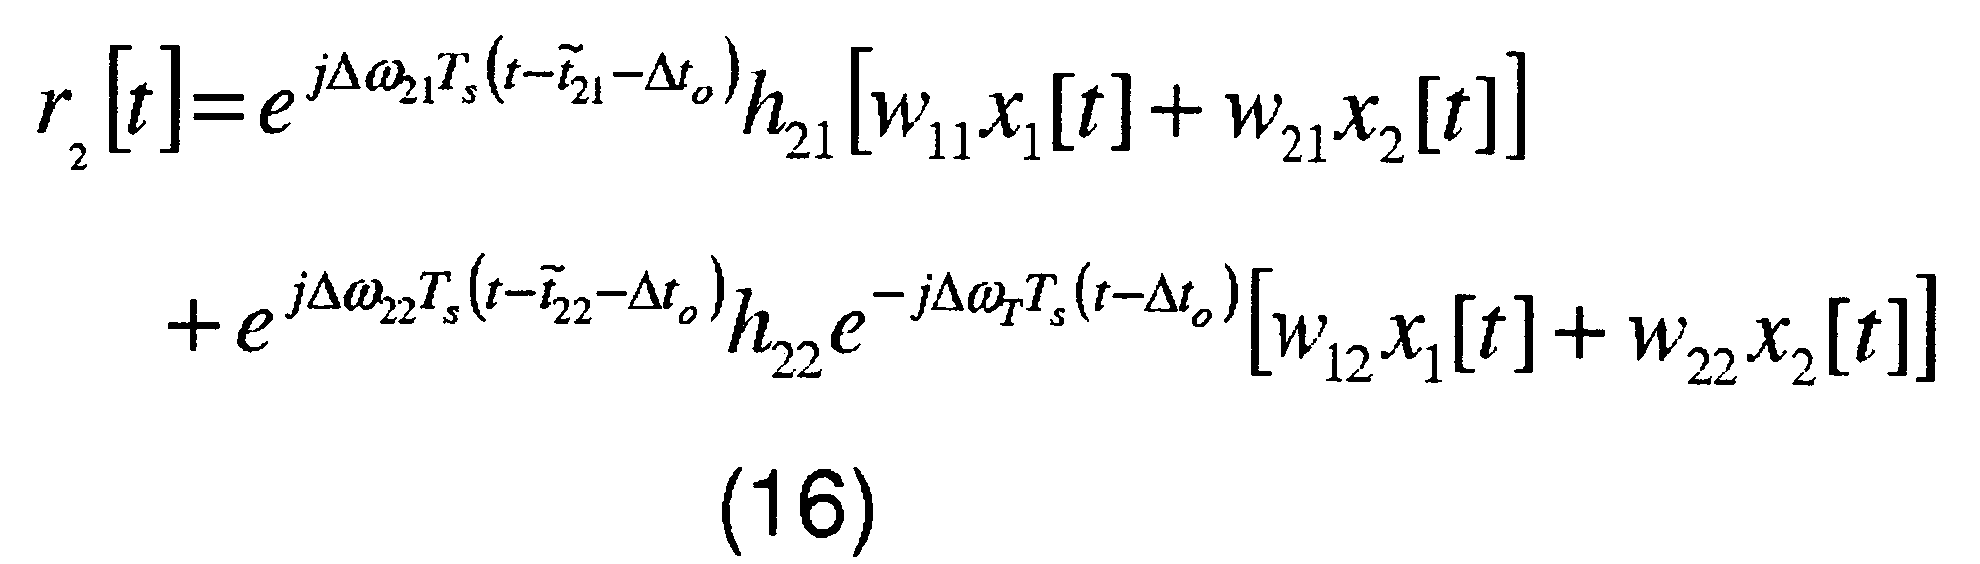 Figure 112015010005017-pat00083